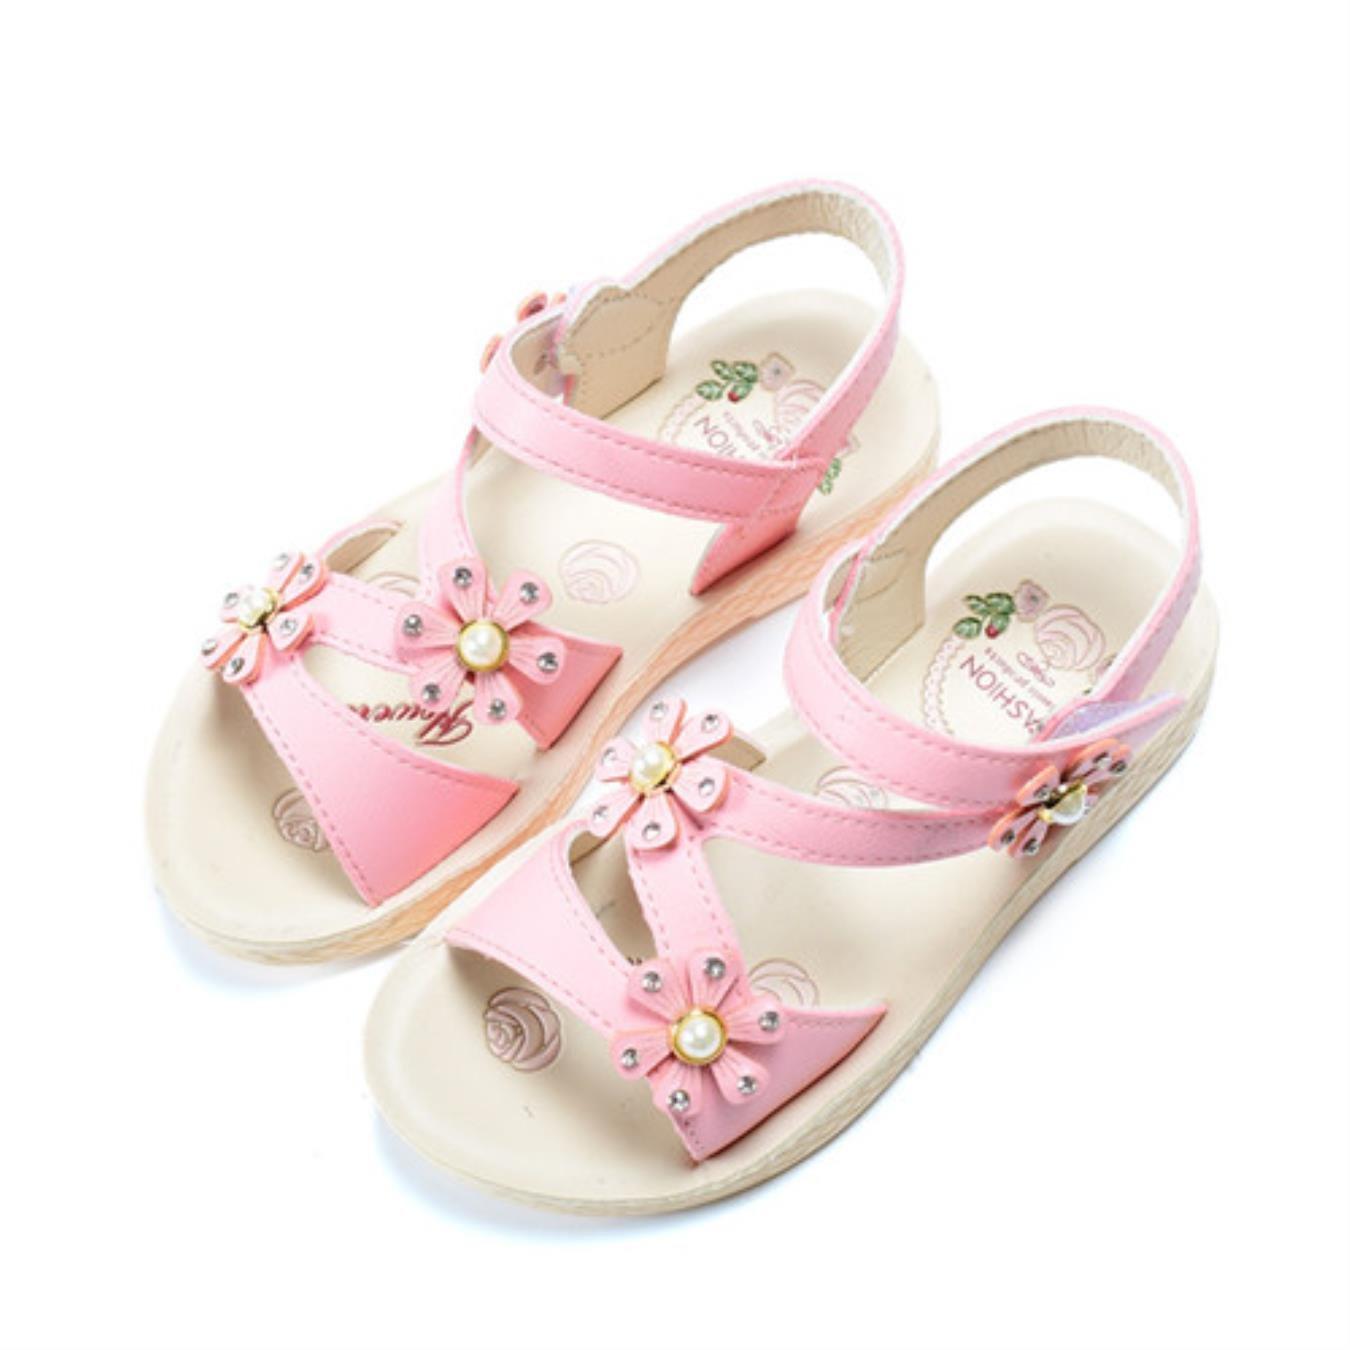 Kids Girls Summer PU Leather Beautiful Flower Pearl Princess Shoes Sandals